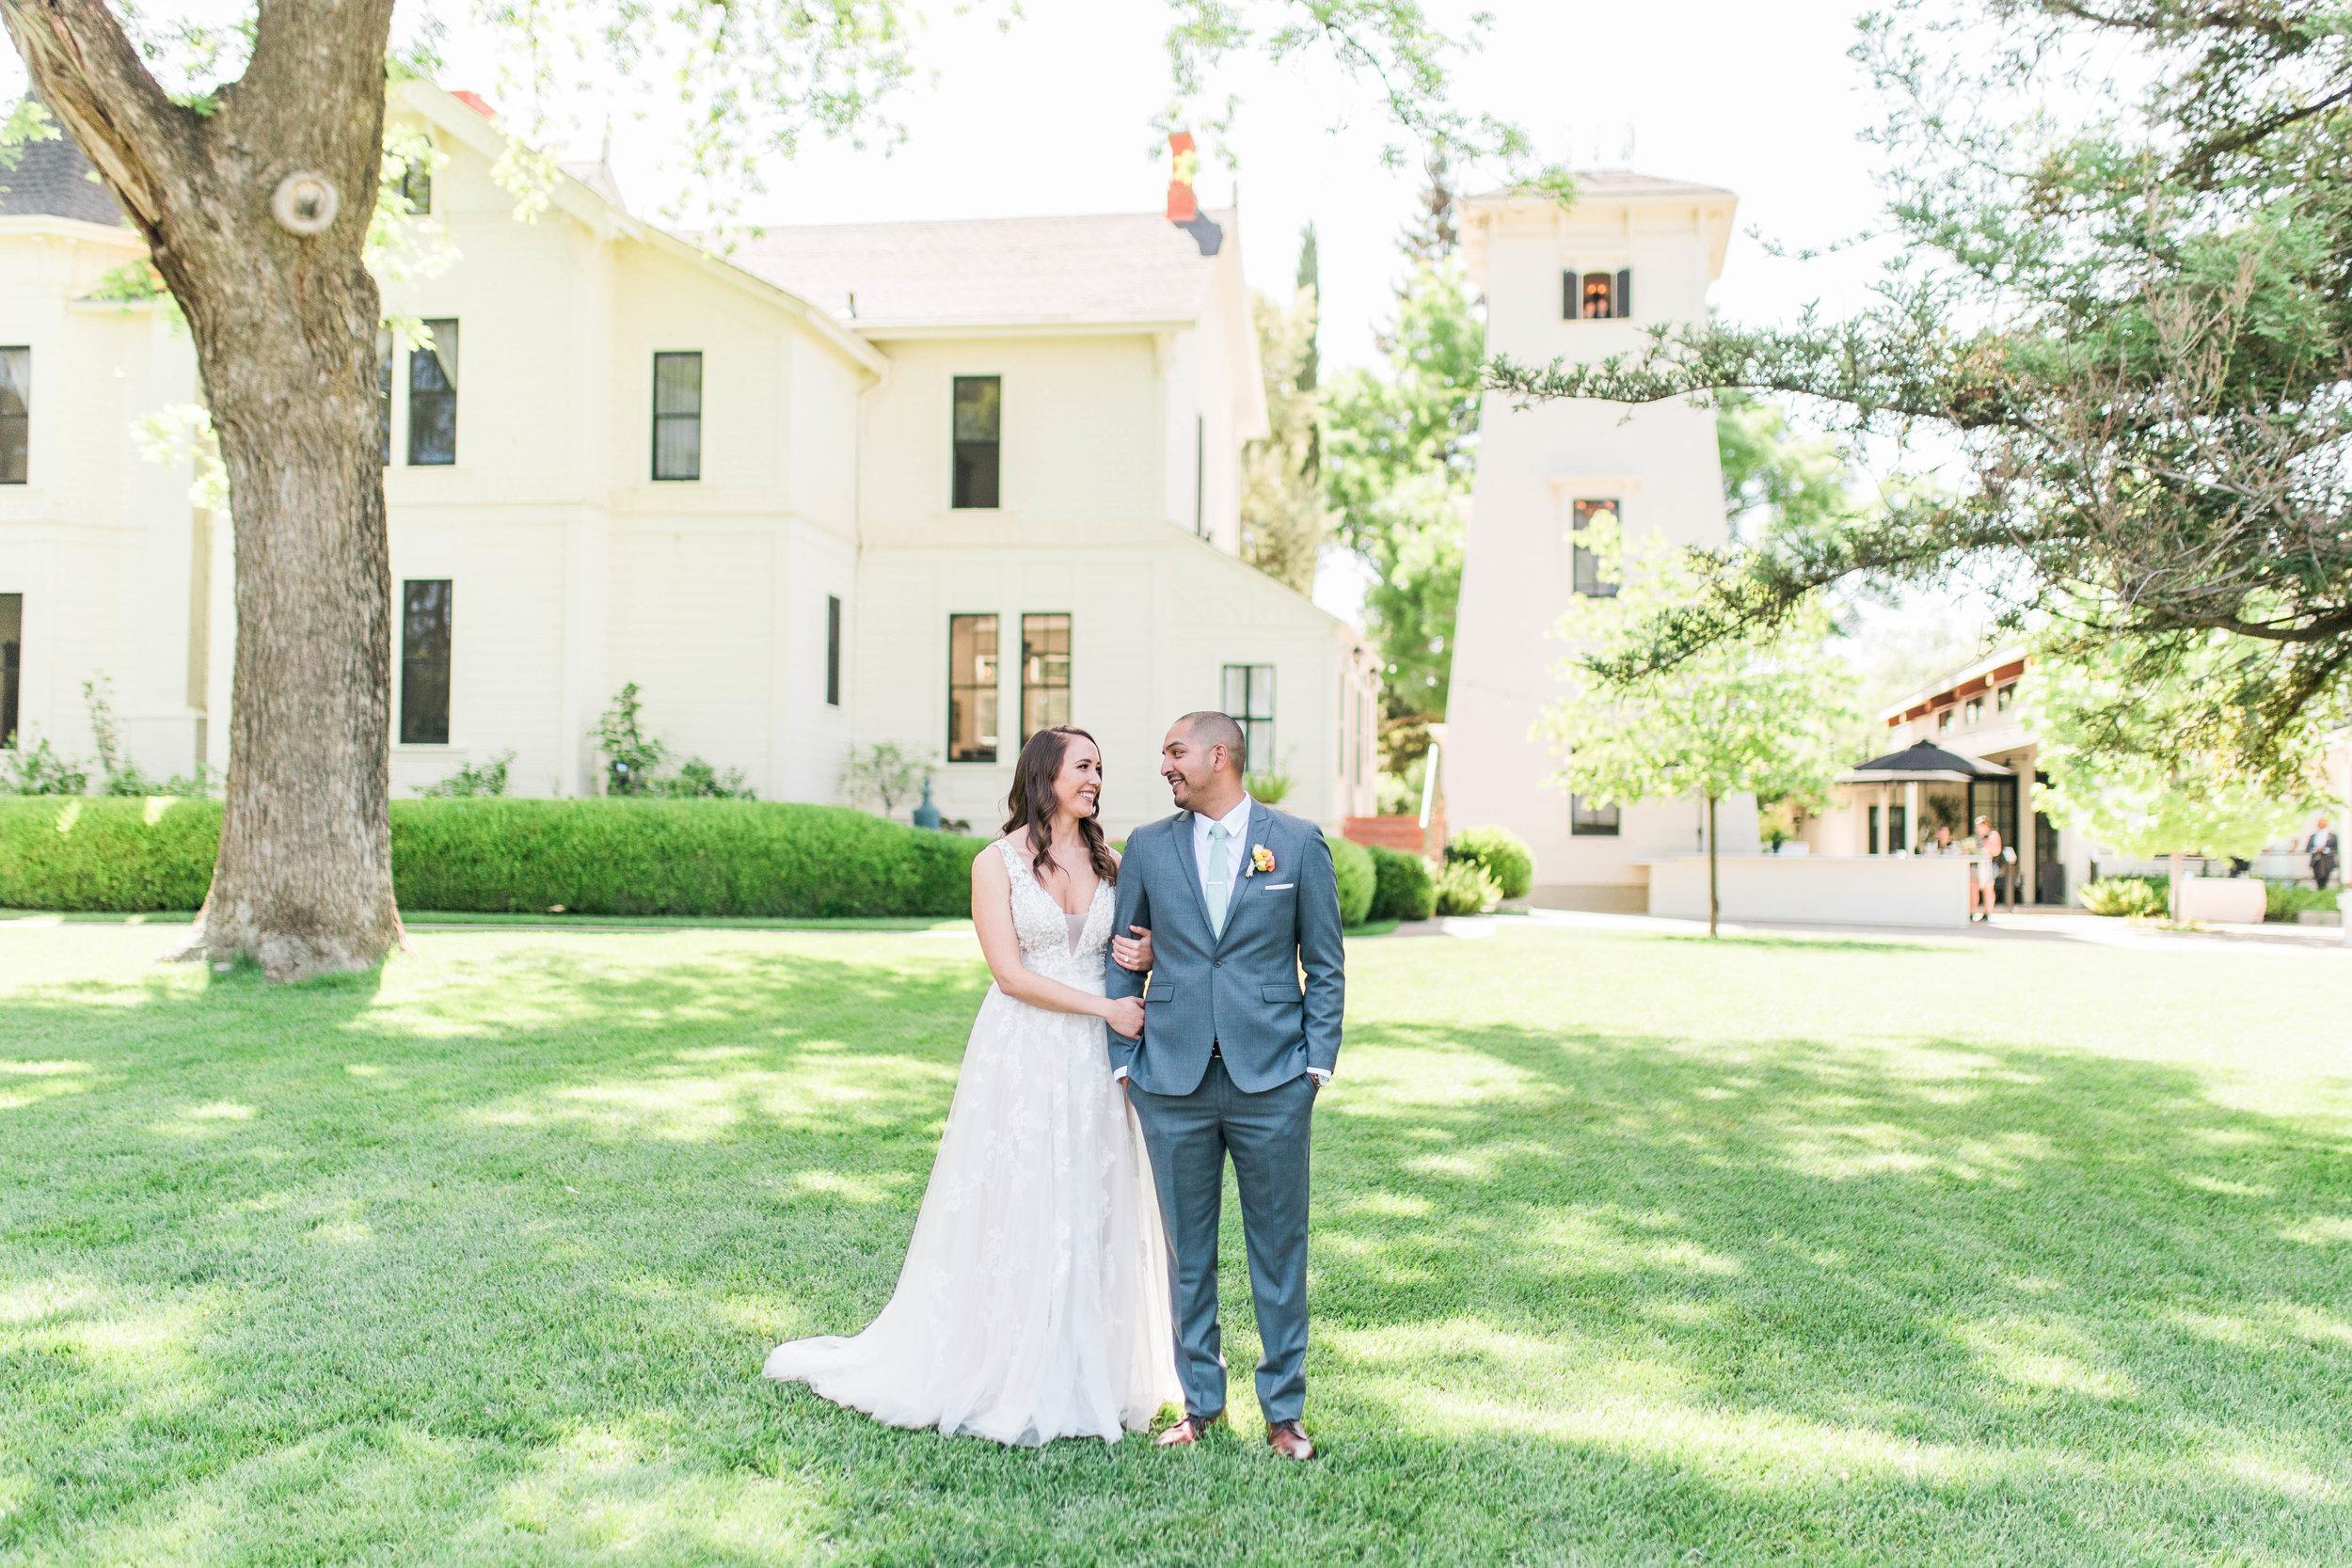 Tess-Jesse-Wedding-SP-by-JBJ-Pictures-6.jpg